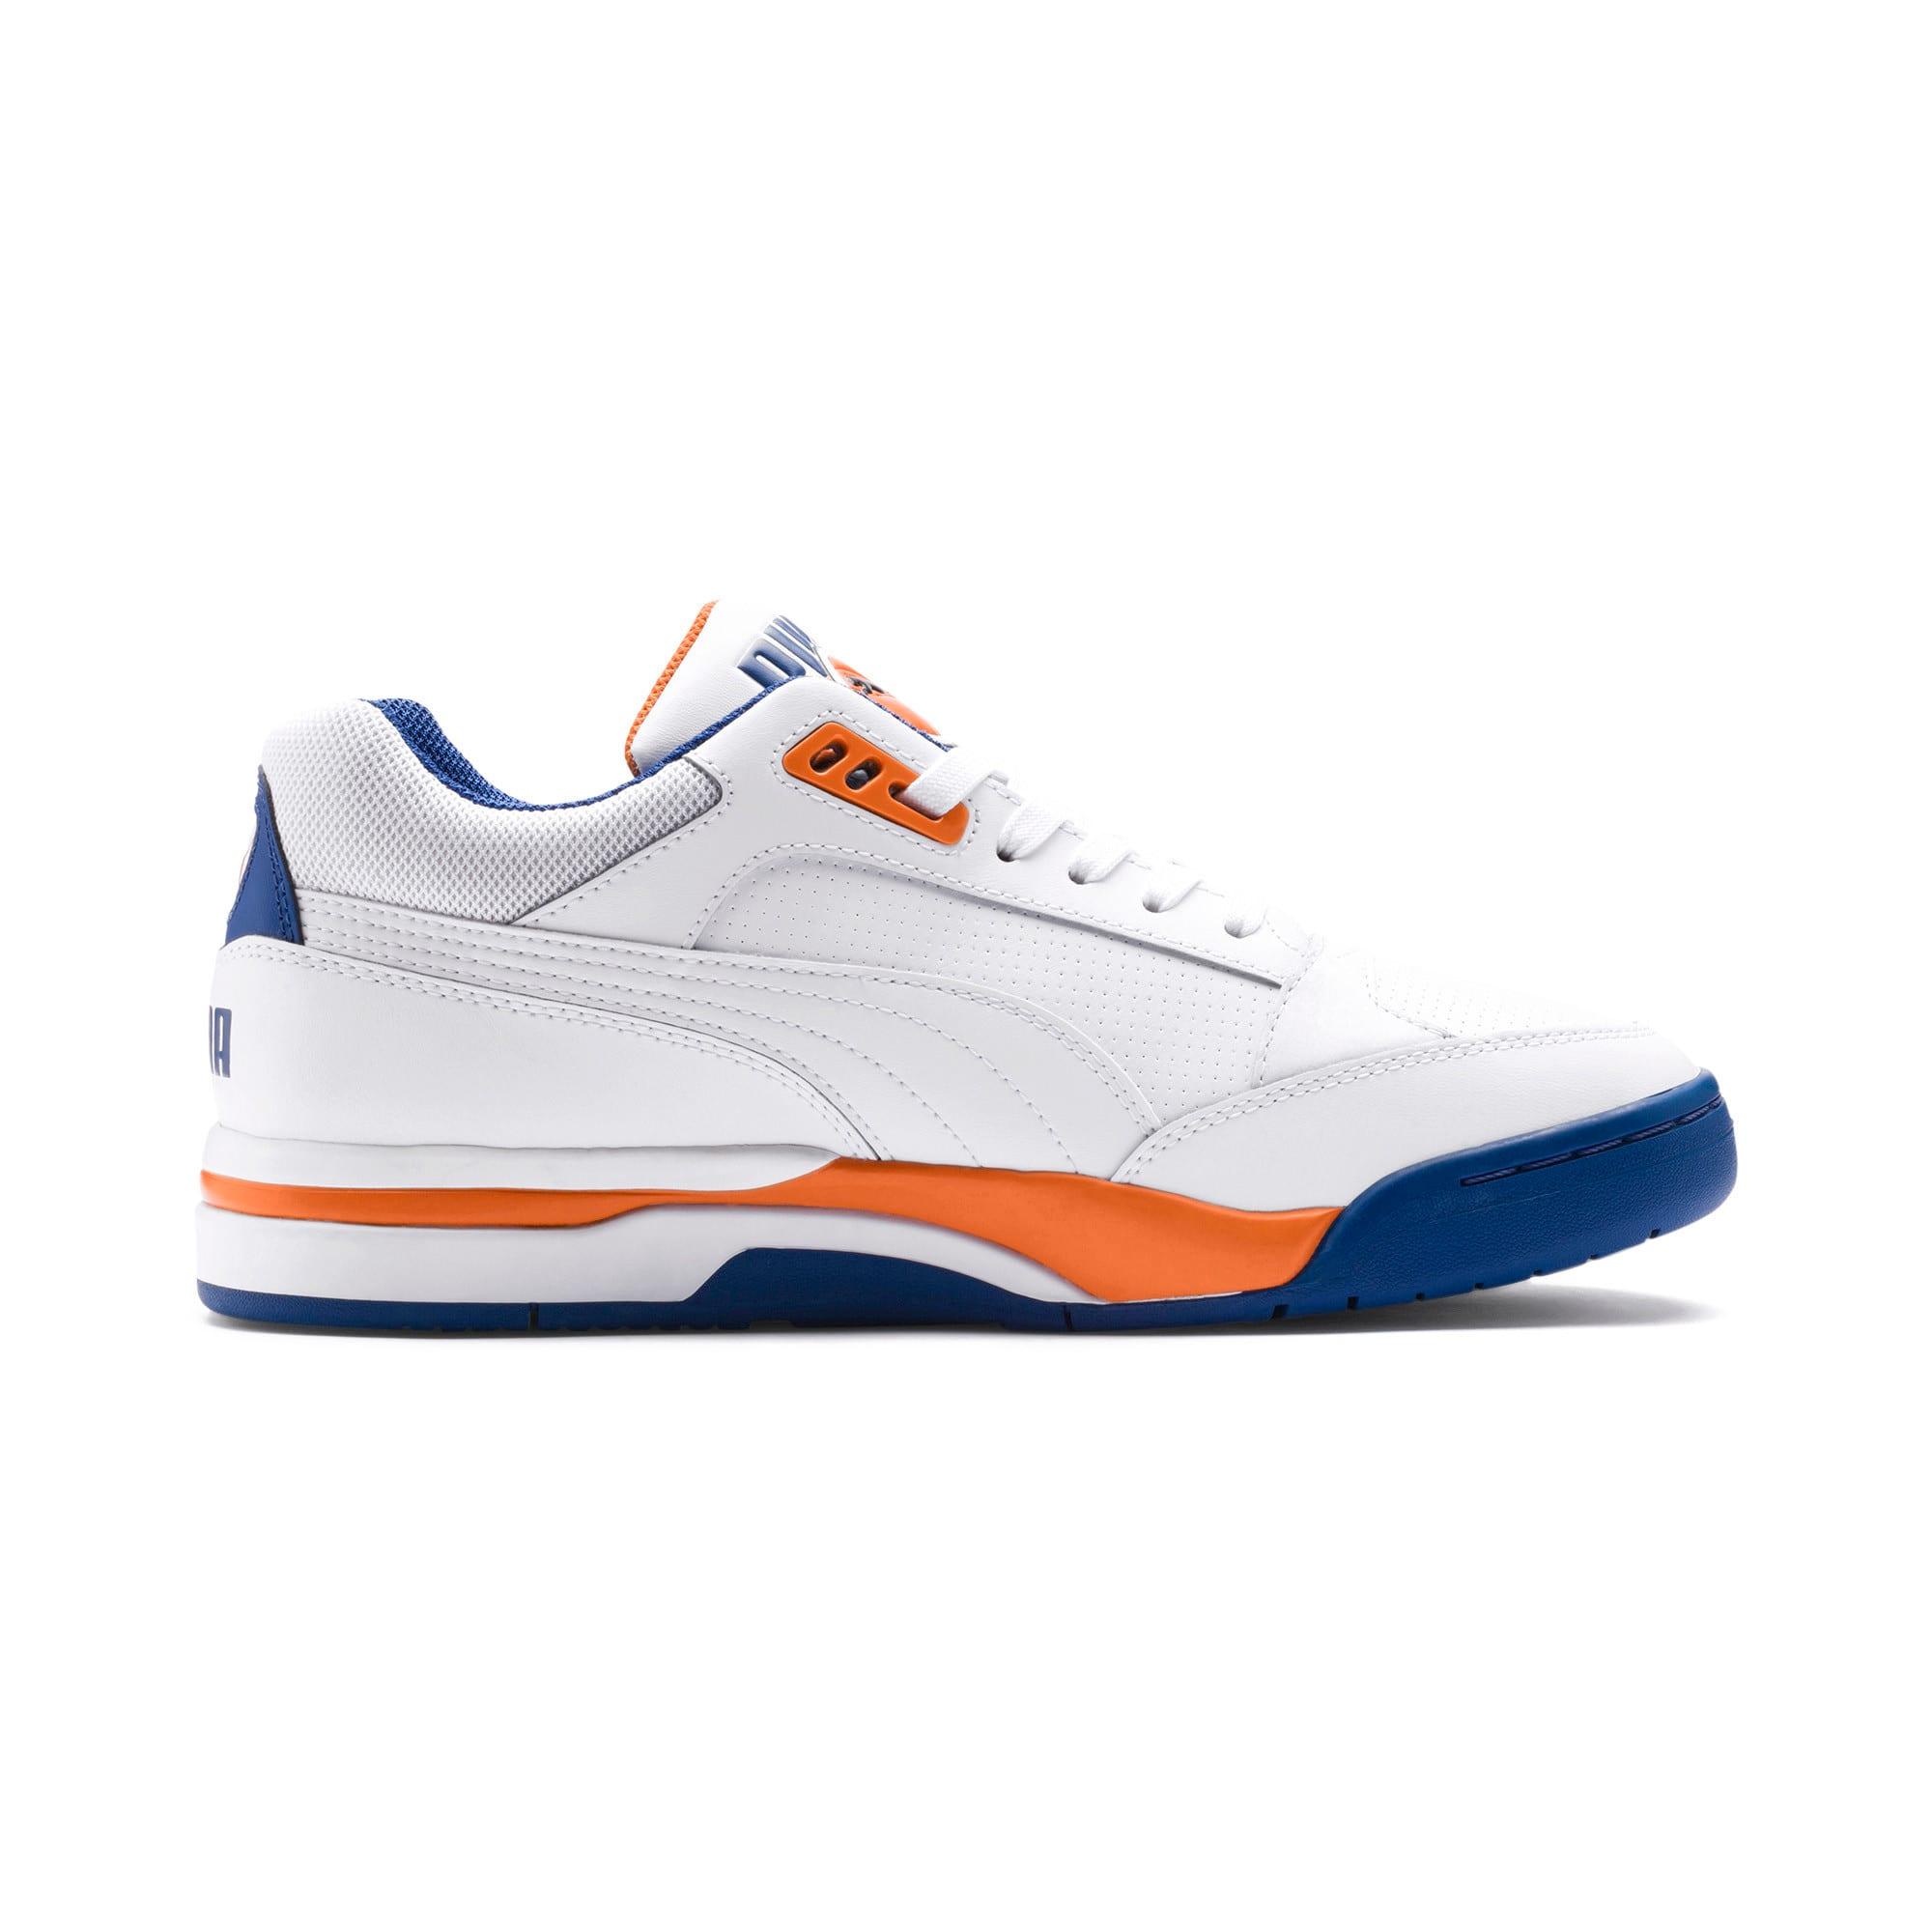 Imagen en miniatura 5 de Zapatillas de baloncesto de hombre Palace Guard, P White-Jaffa Orange-G Blue, mediana